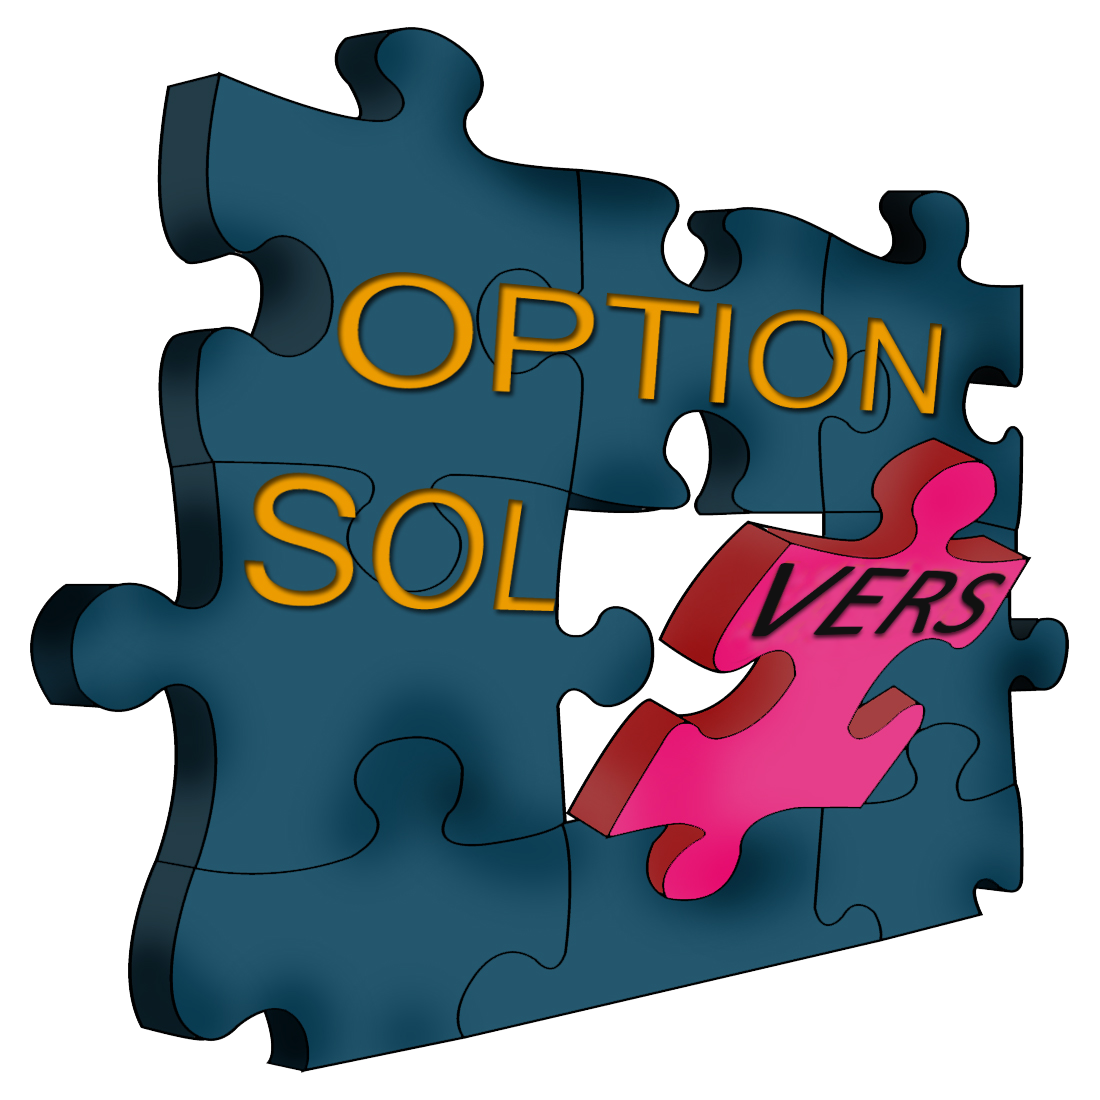 Option Solvers